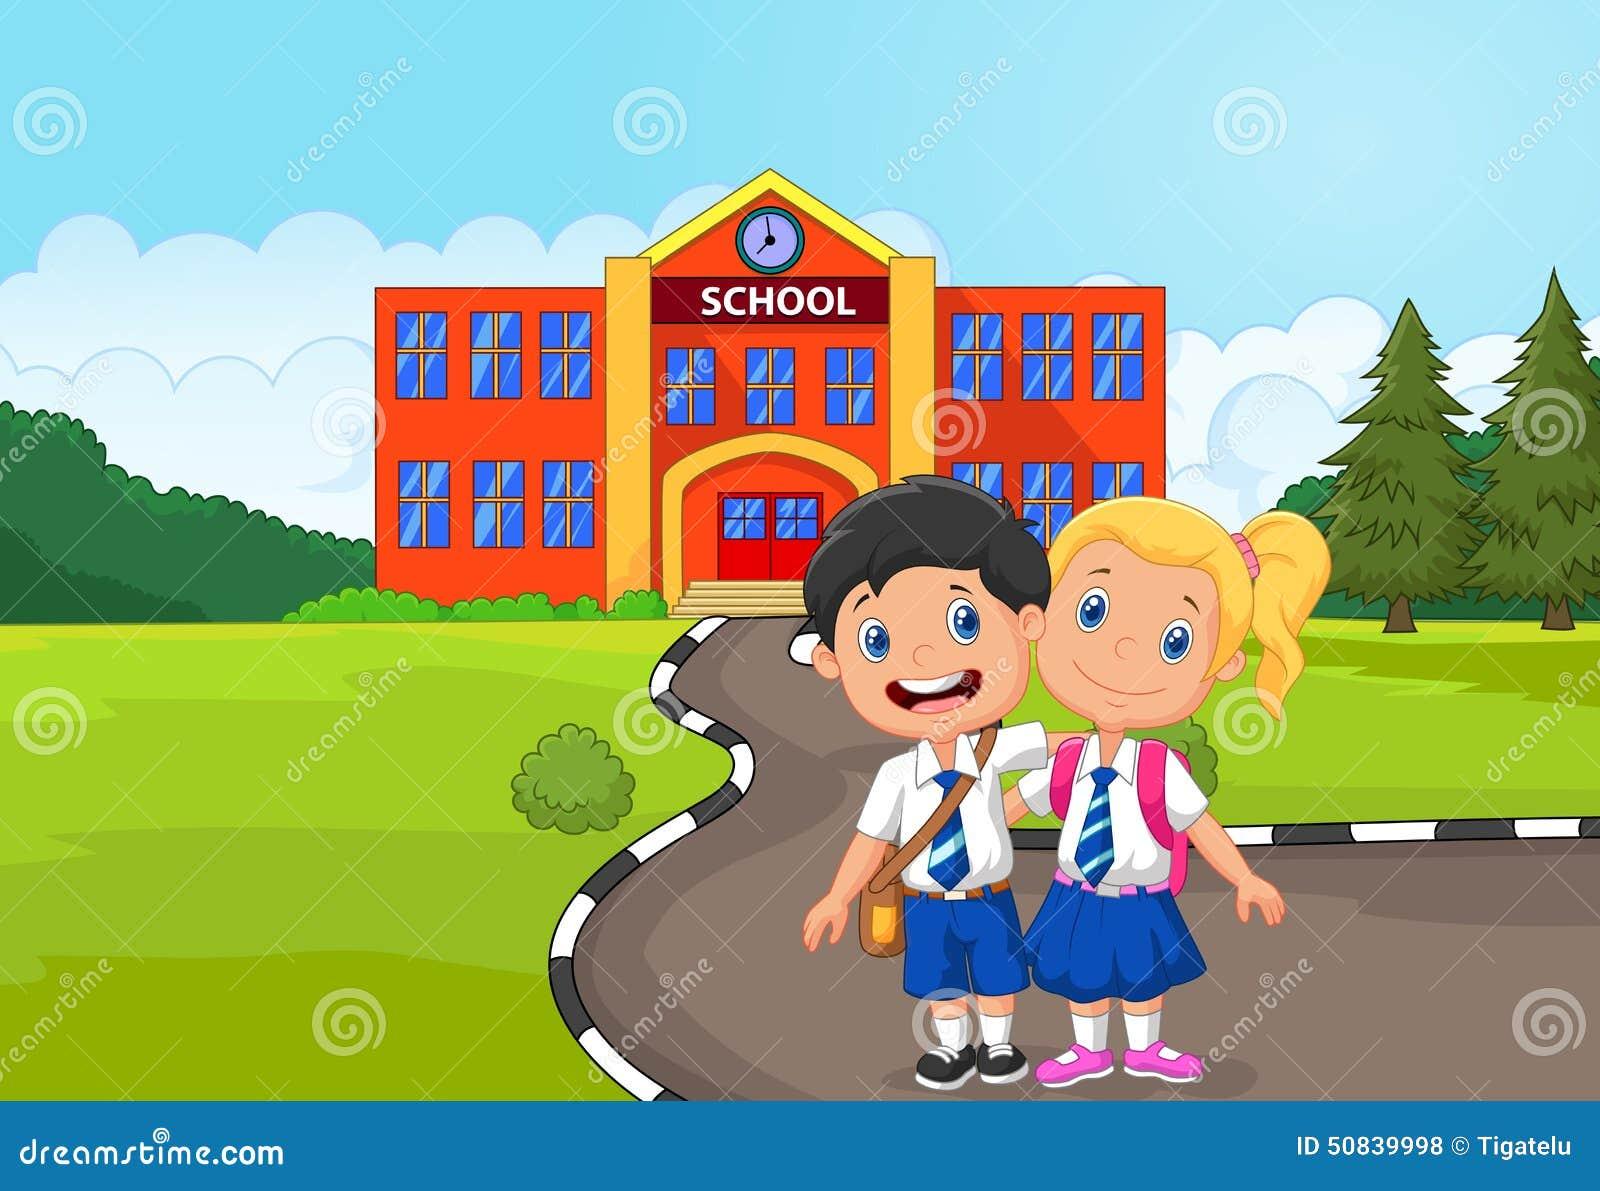 Two Happy Students Cartoon Standing In Front Of School Building Stock